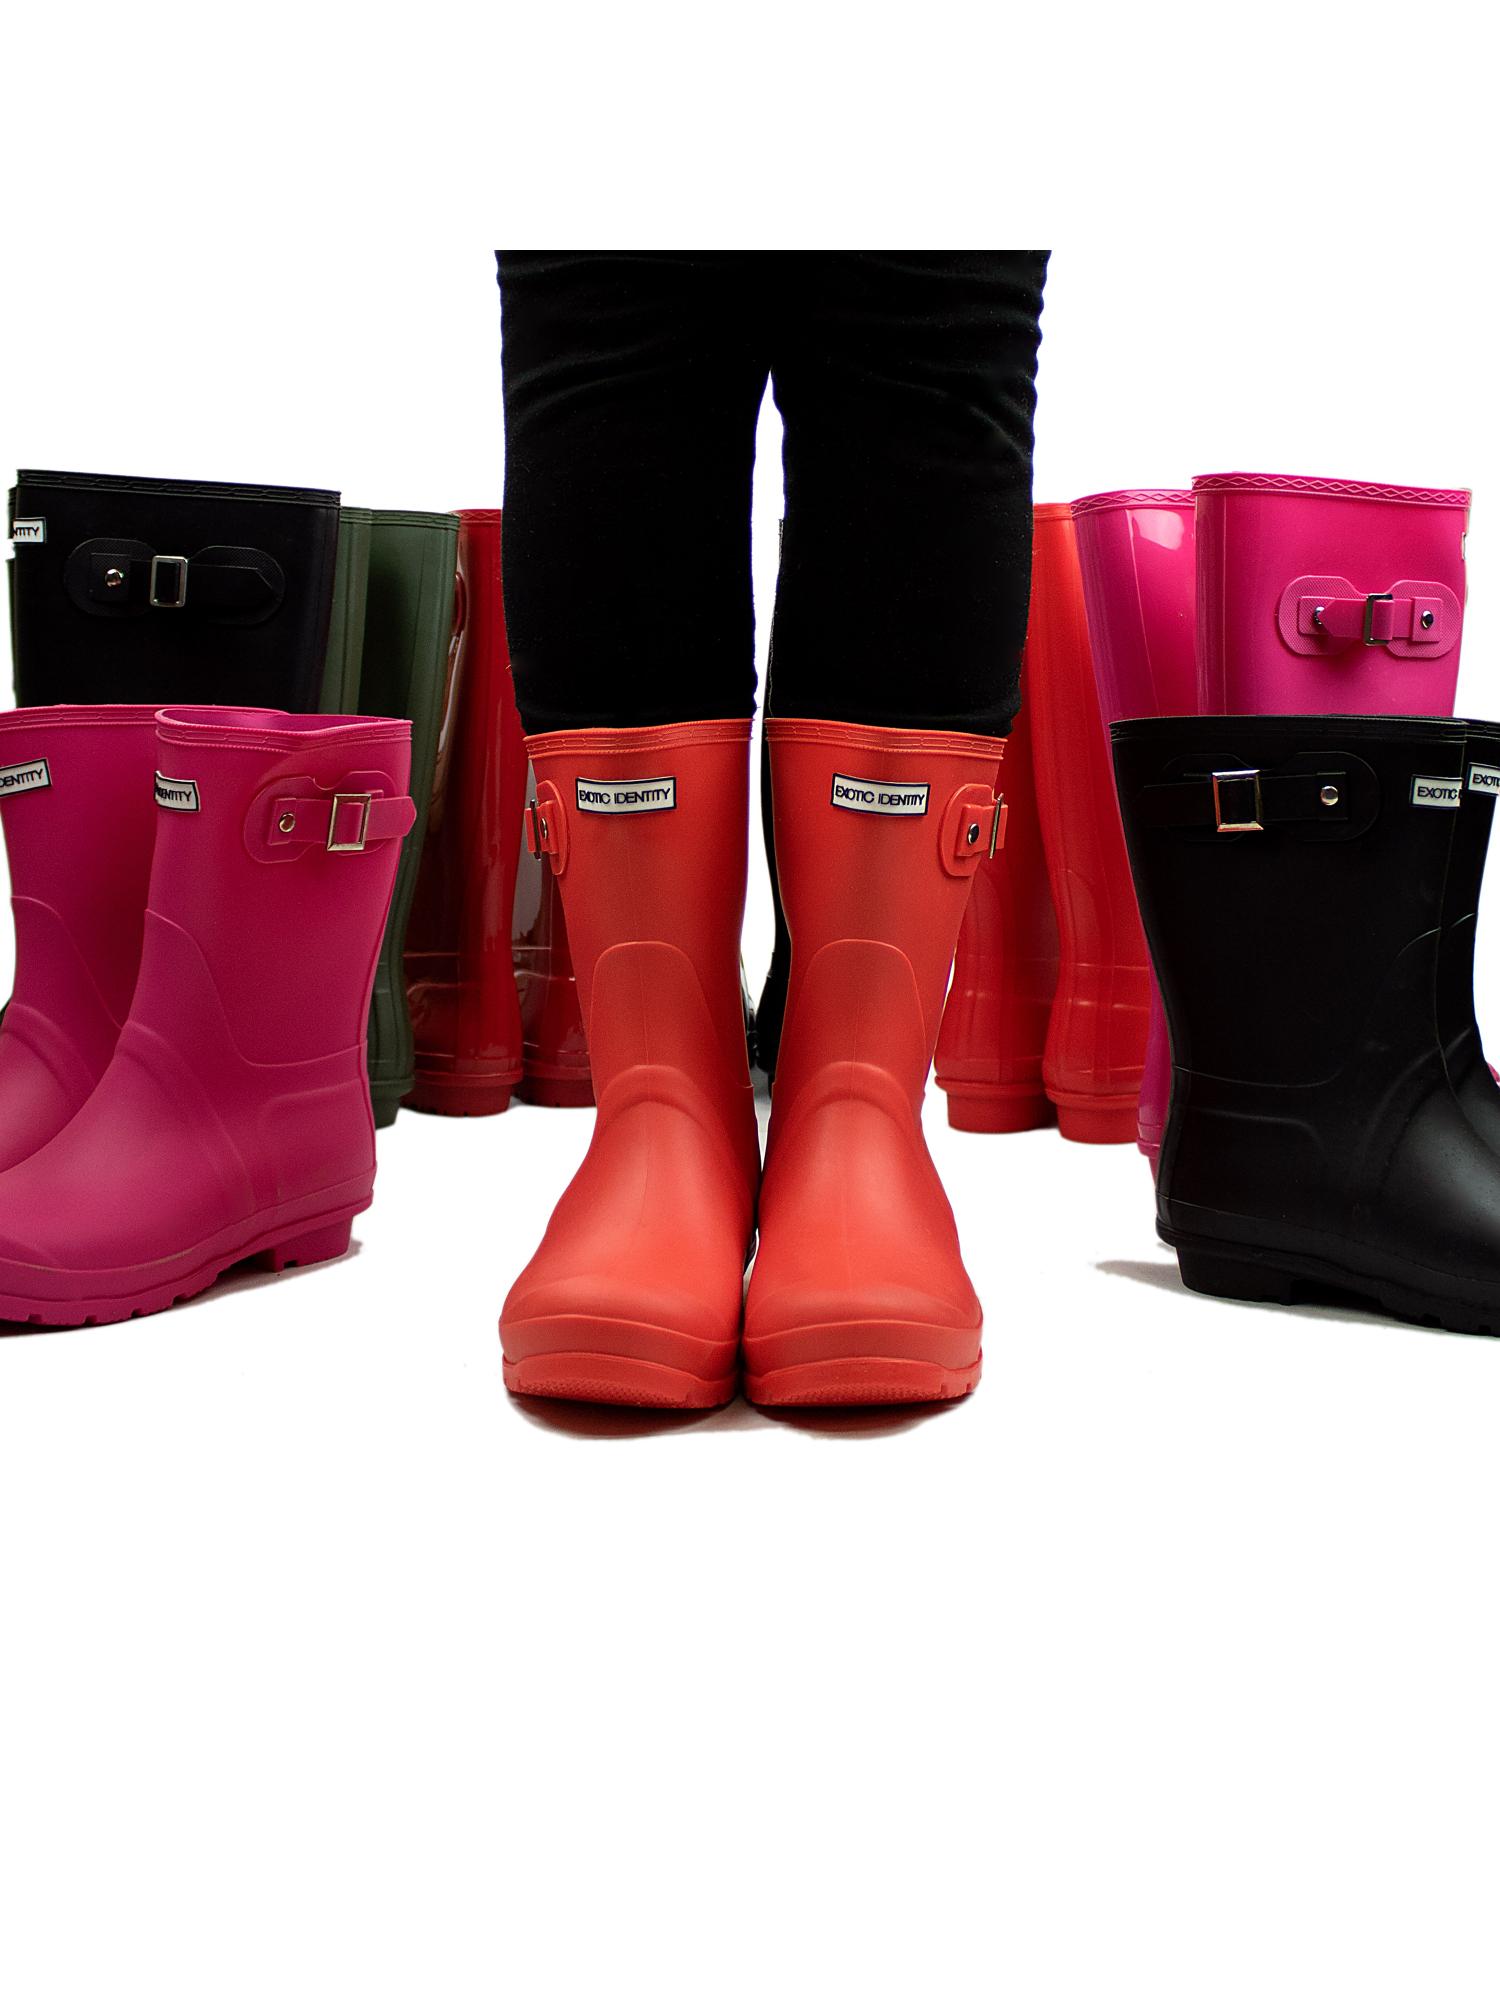 Exotic-Identity-Short-Rain-Boots-Non-Slip-100-Waterproof-for-Women thumbnail 11